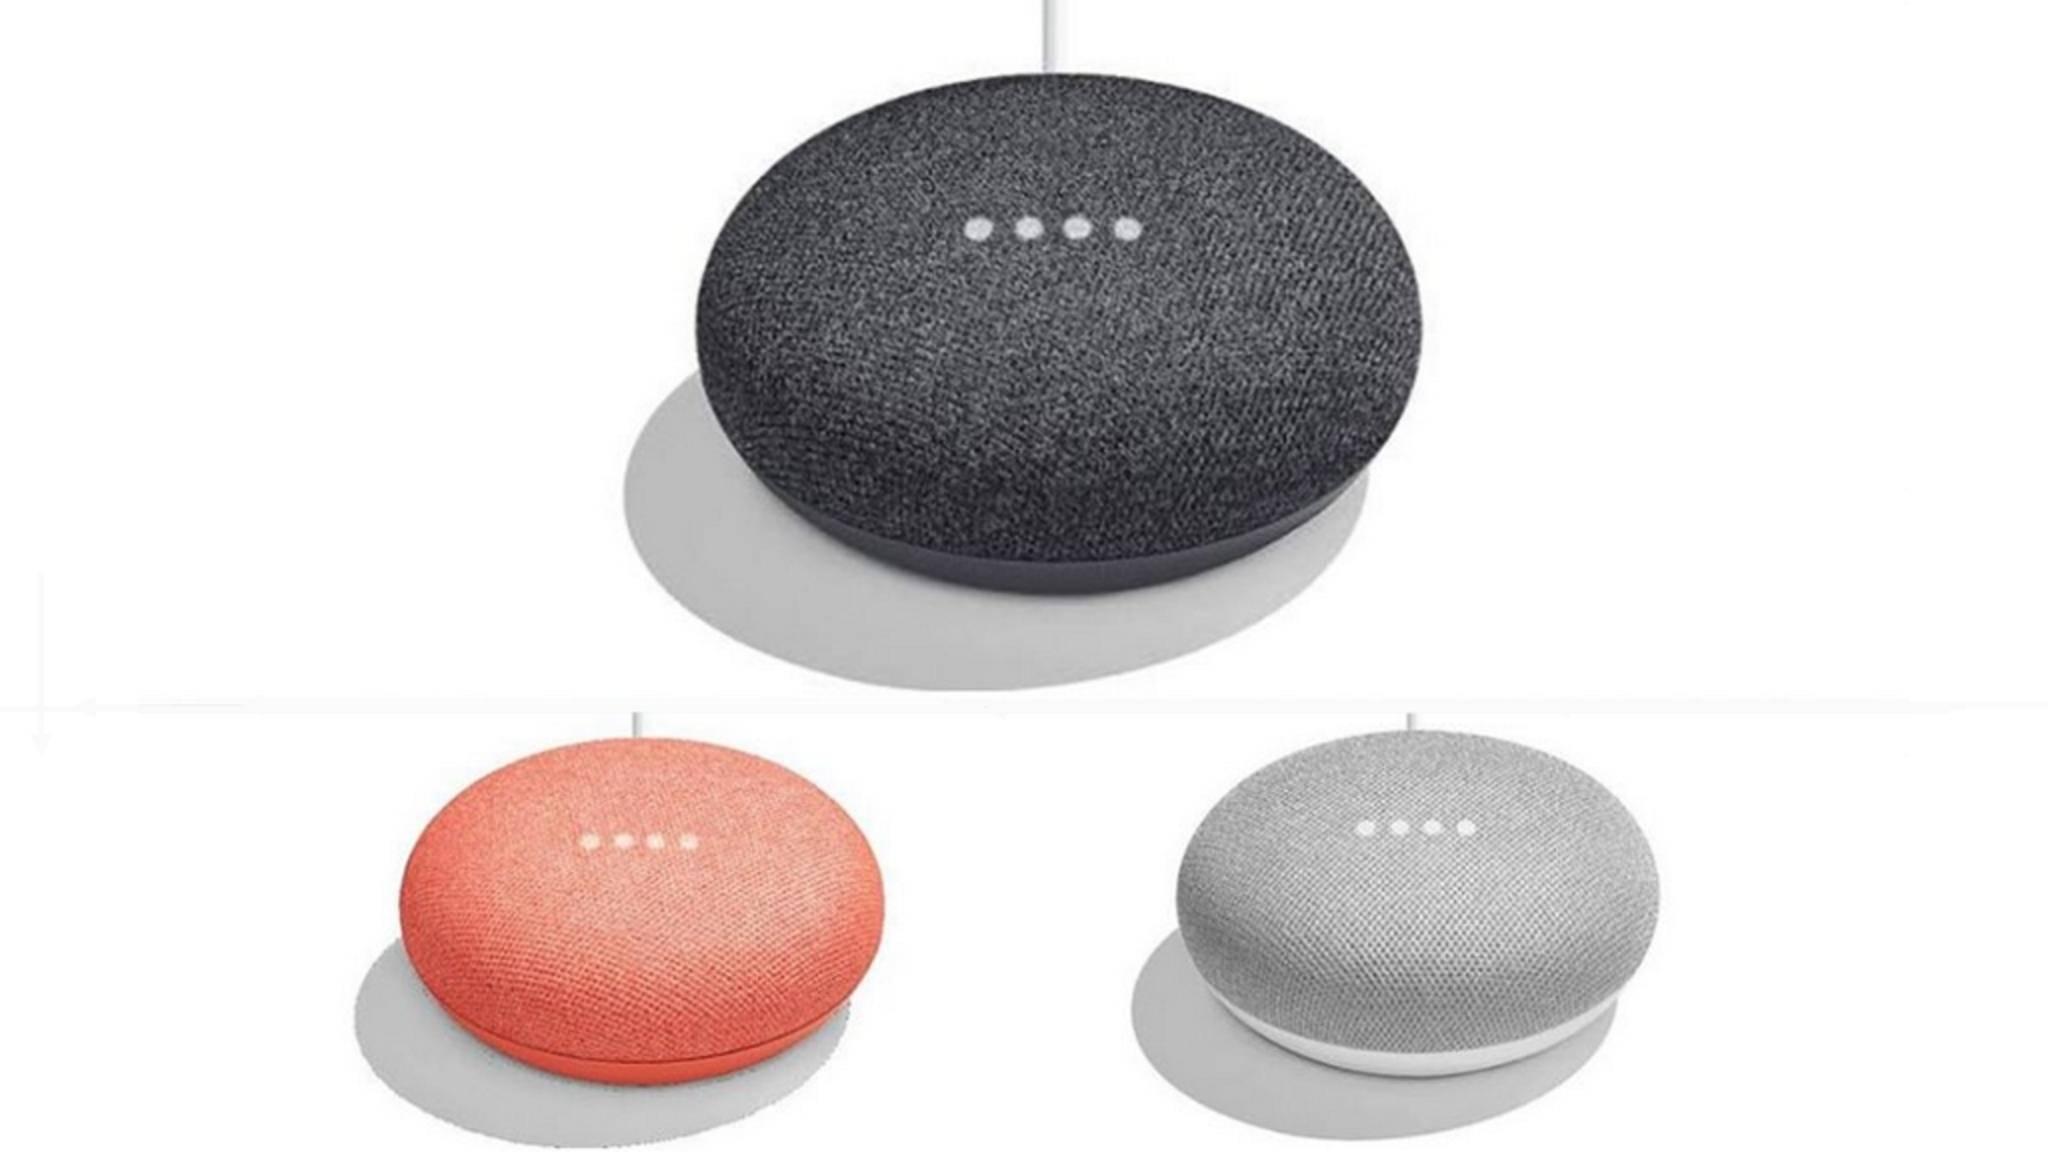 Knapp 50 US-Dollar soll der neue Google Home Mini kosten.